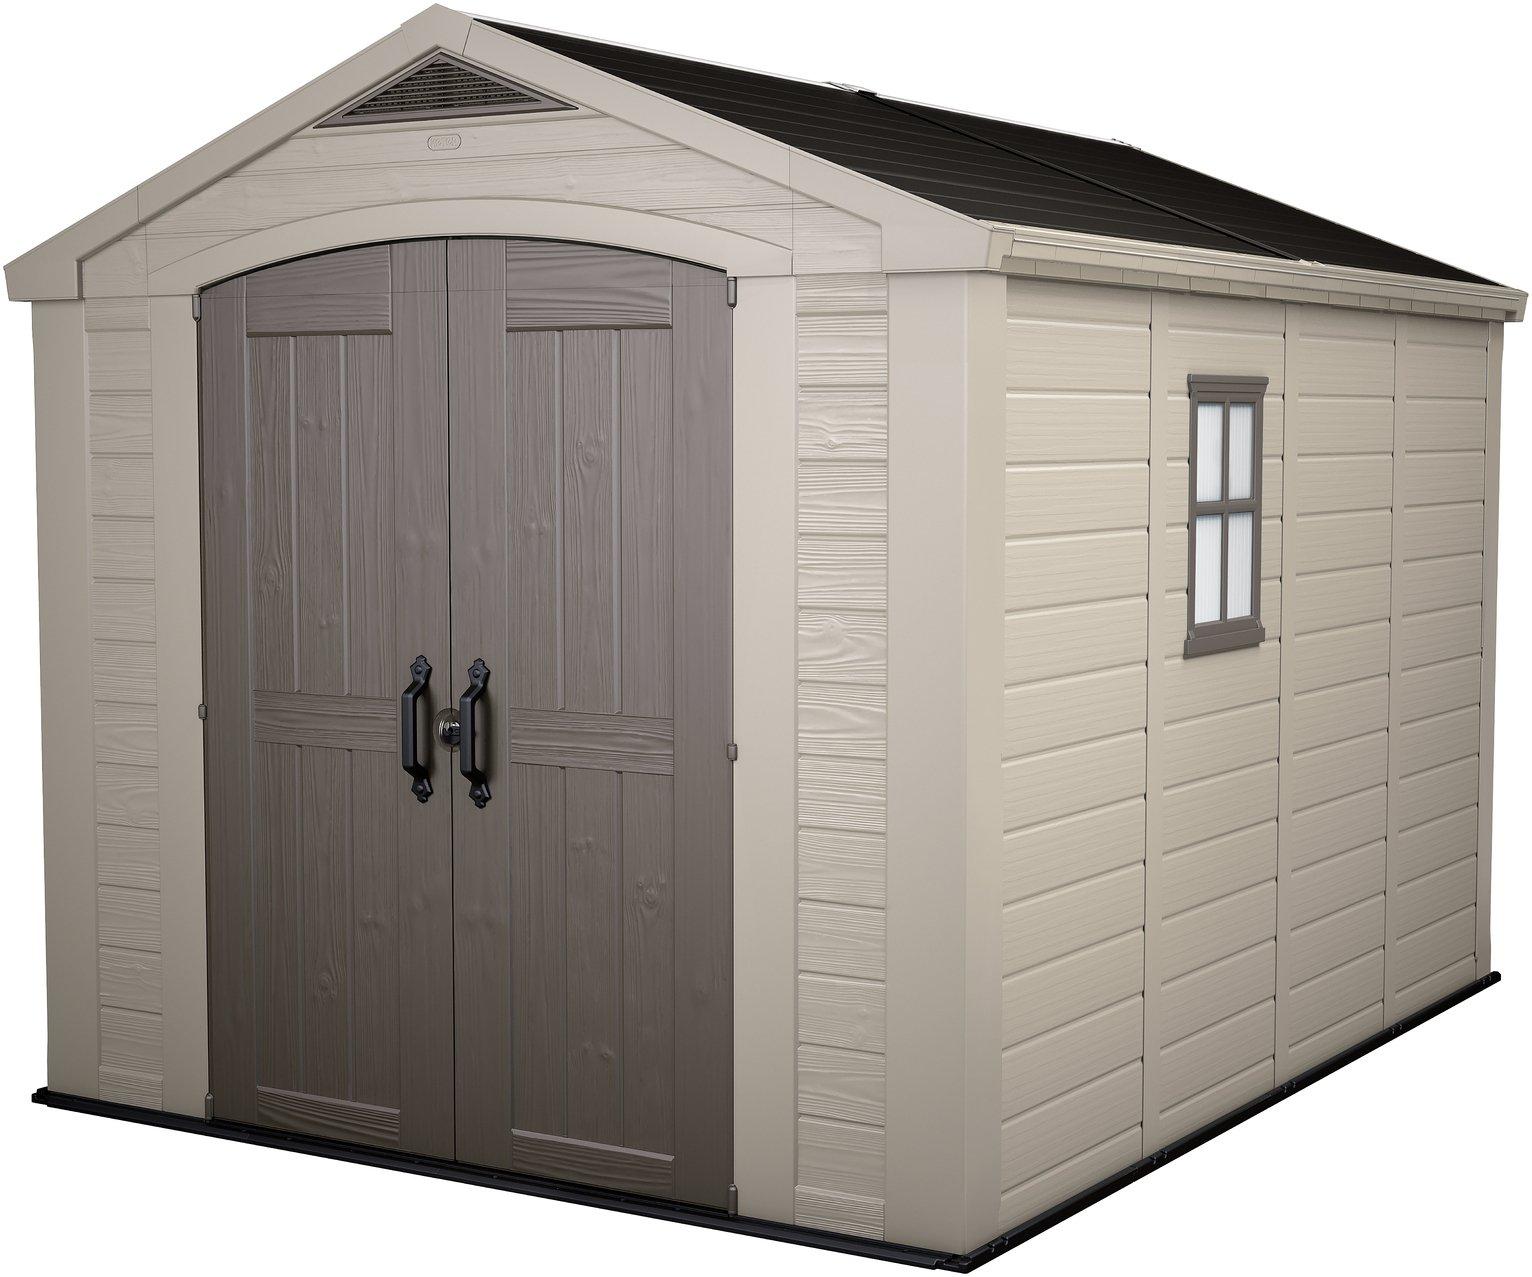 Garden Sheds Argos buy keter apex plastic beige & brown garden shed - 8 x 11ft at